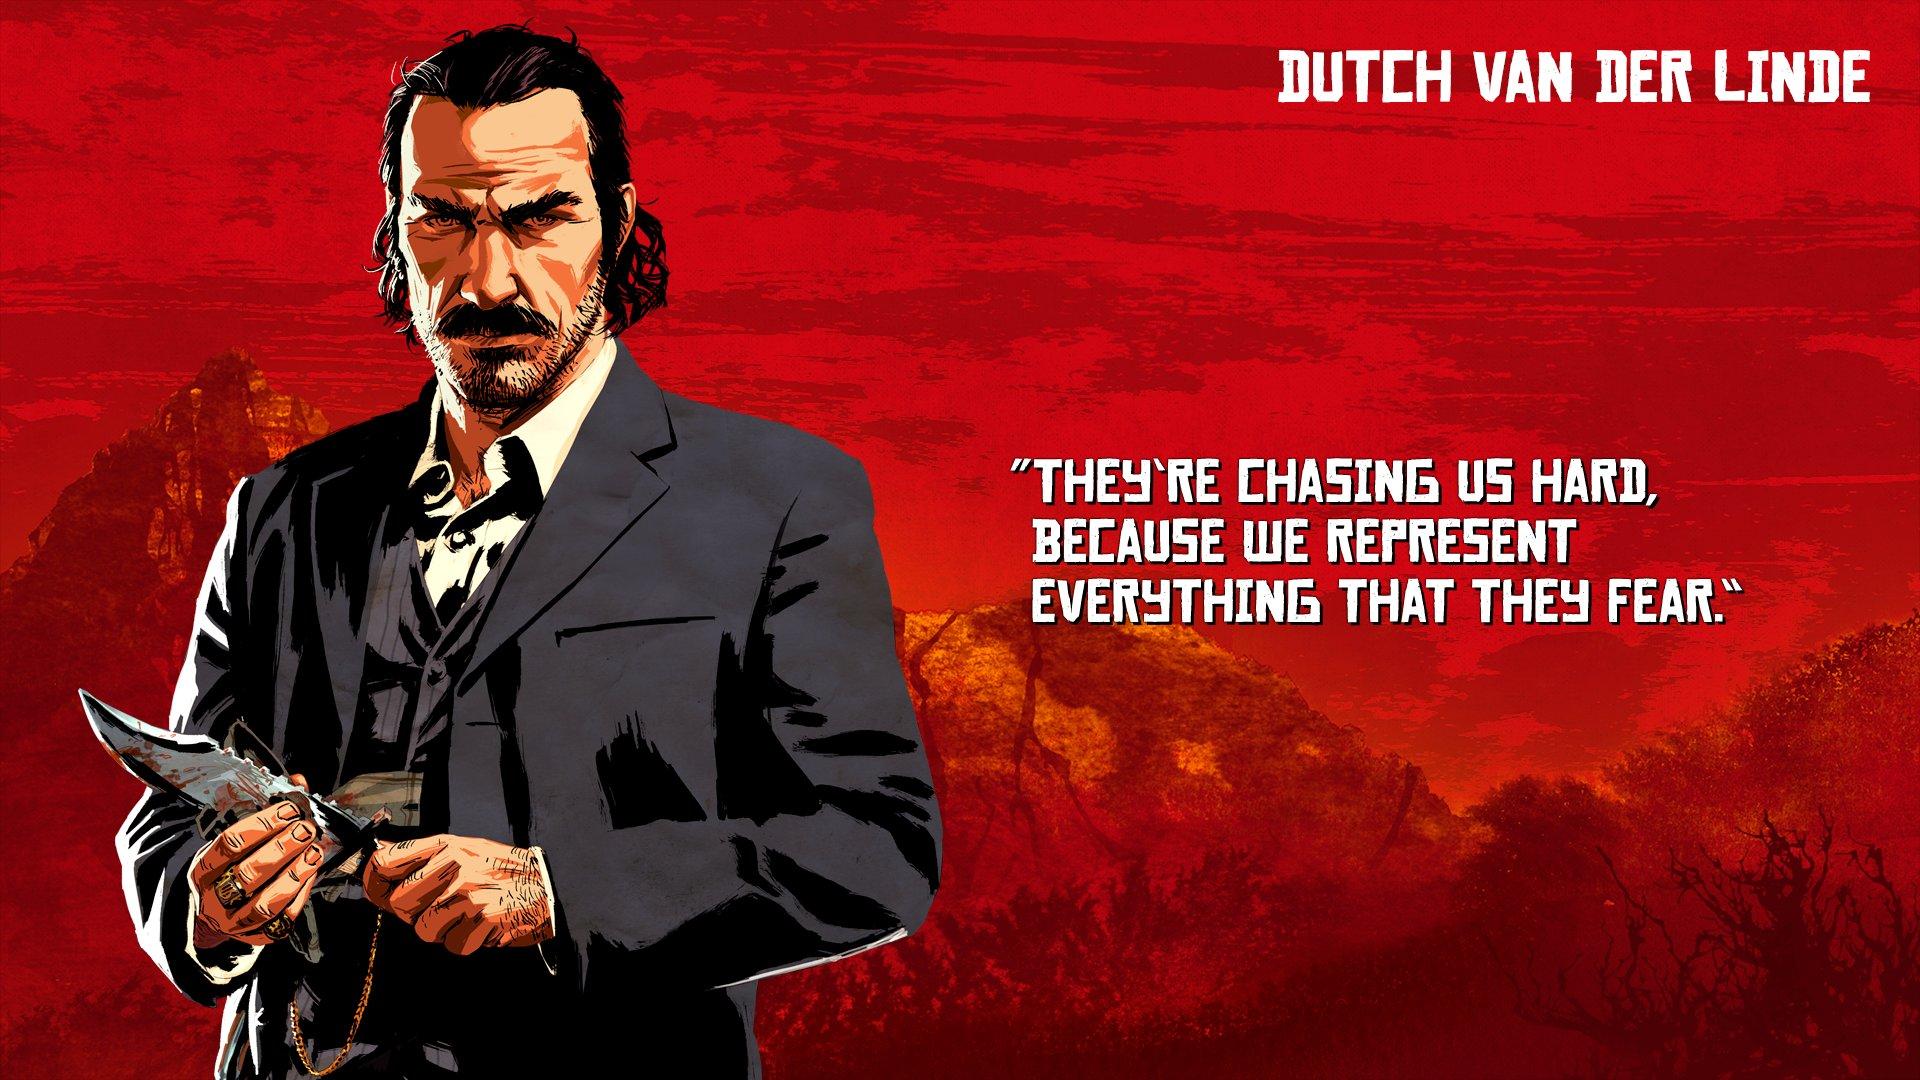 Rockstar Games revela artes dos personagens de Red Dead Redemption 2; veja 6